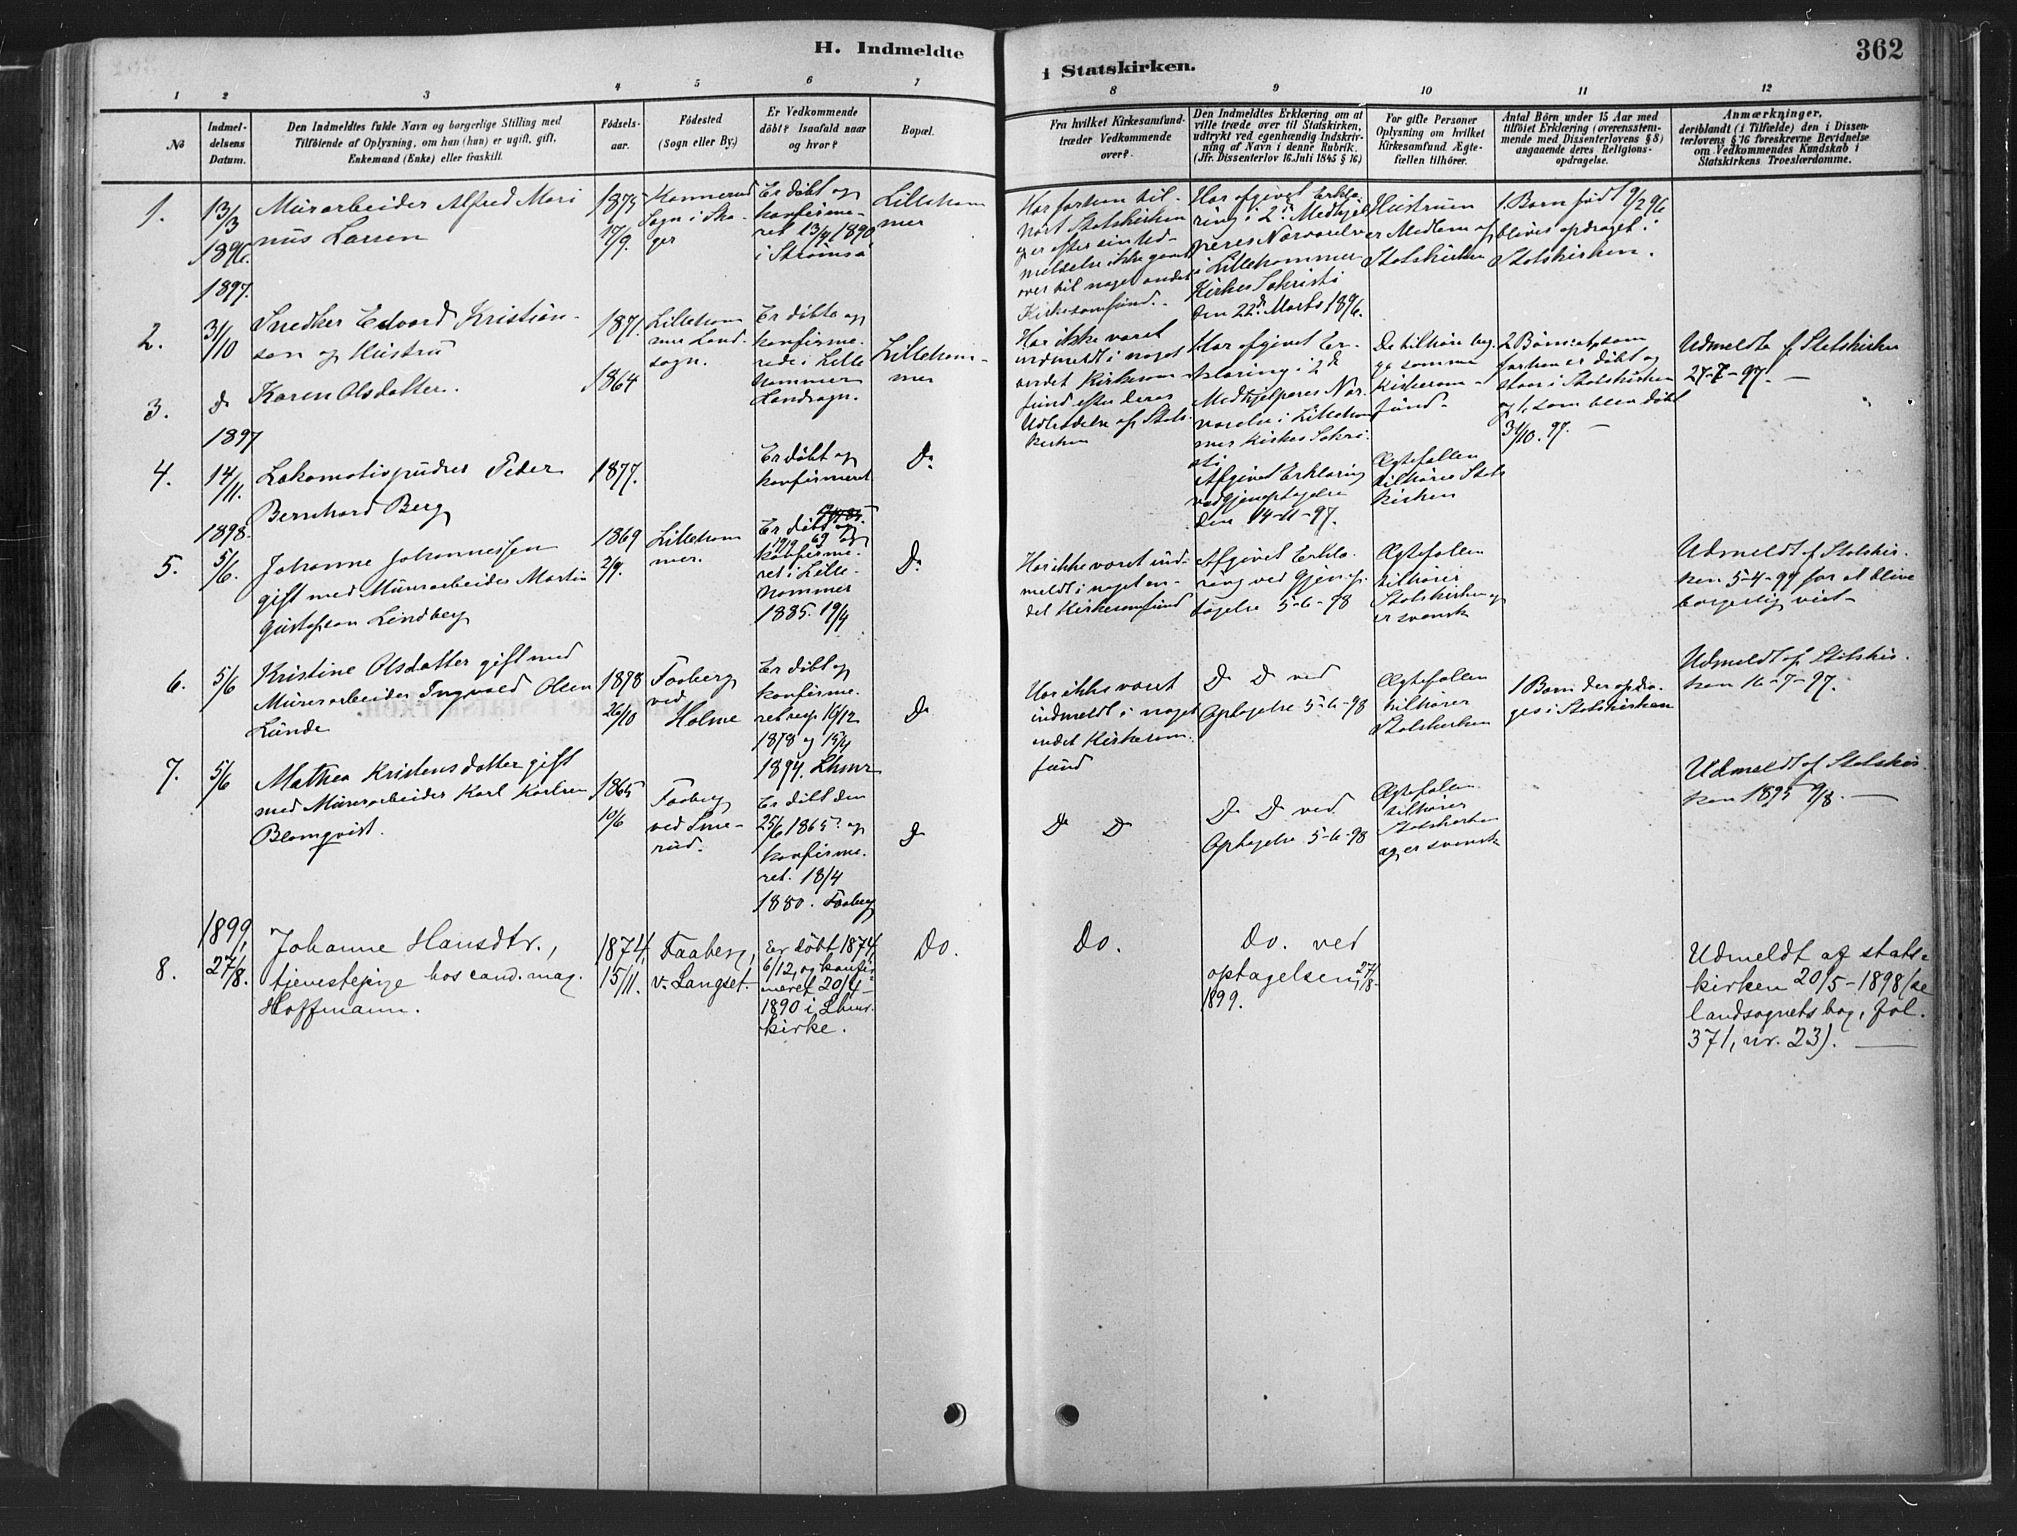 SAH, Fåberg prestekontor, H/Ha/Haa/L0010: Parish register (official) no. 10, 1879-1900, p. 362